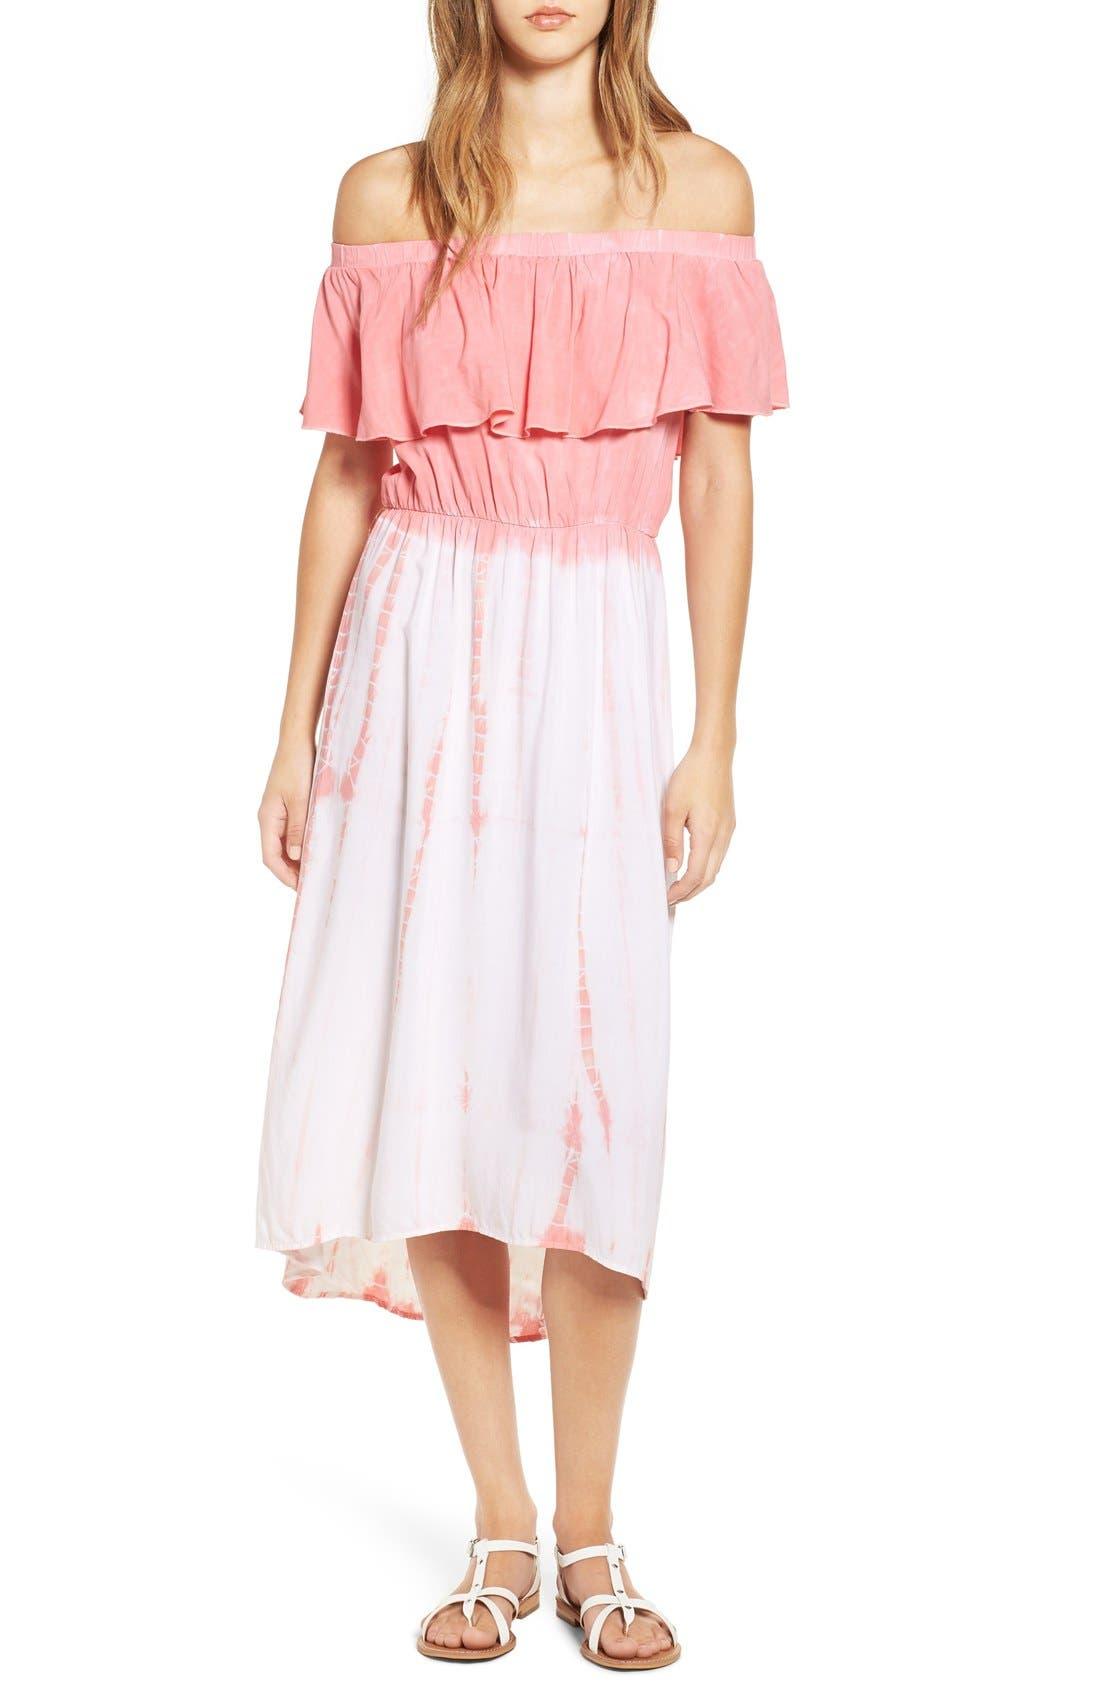 Alternate Image 1 Selected - jella c. Off the Shoulder Tie Dye Midi Dress